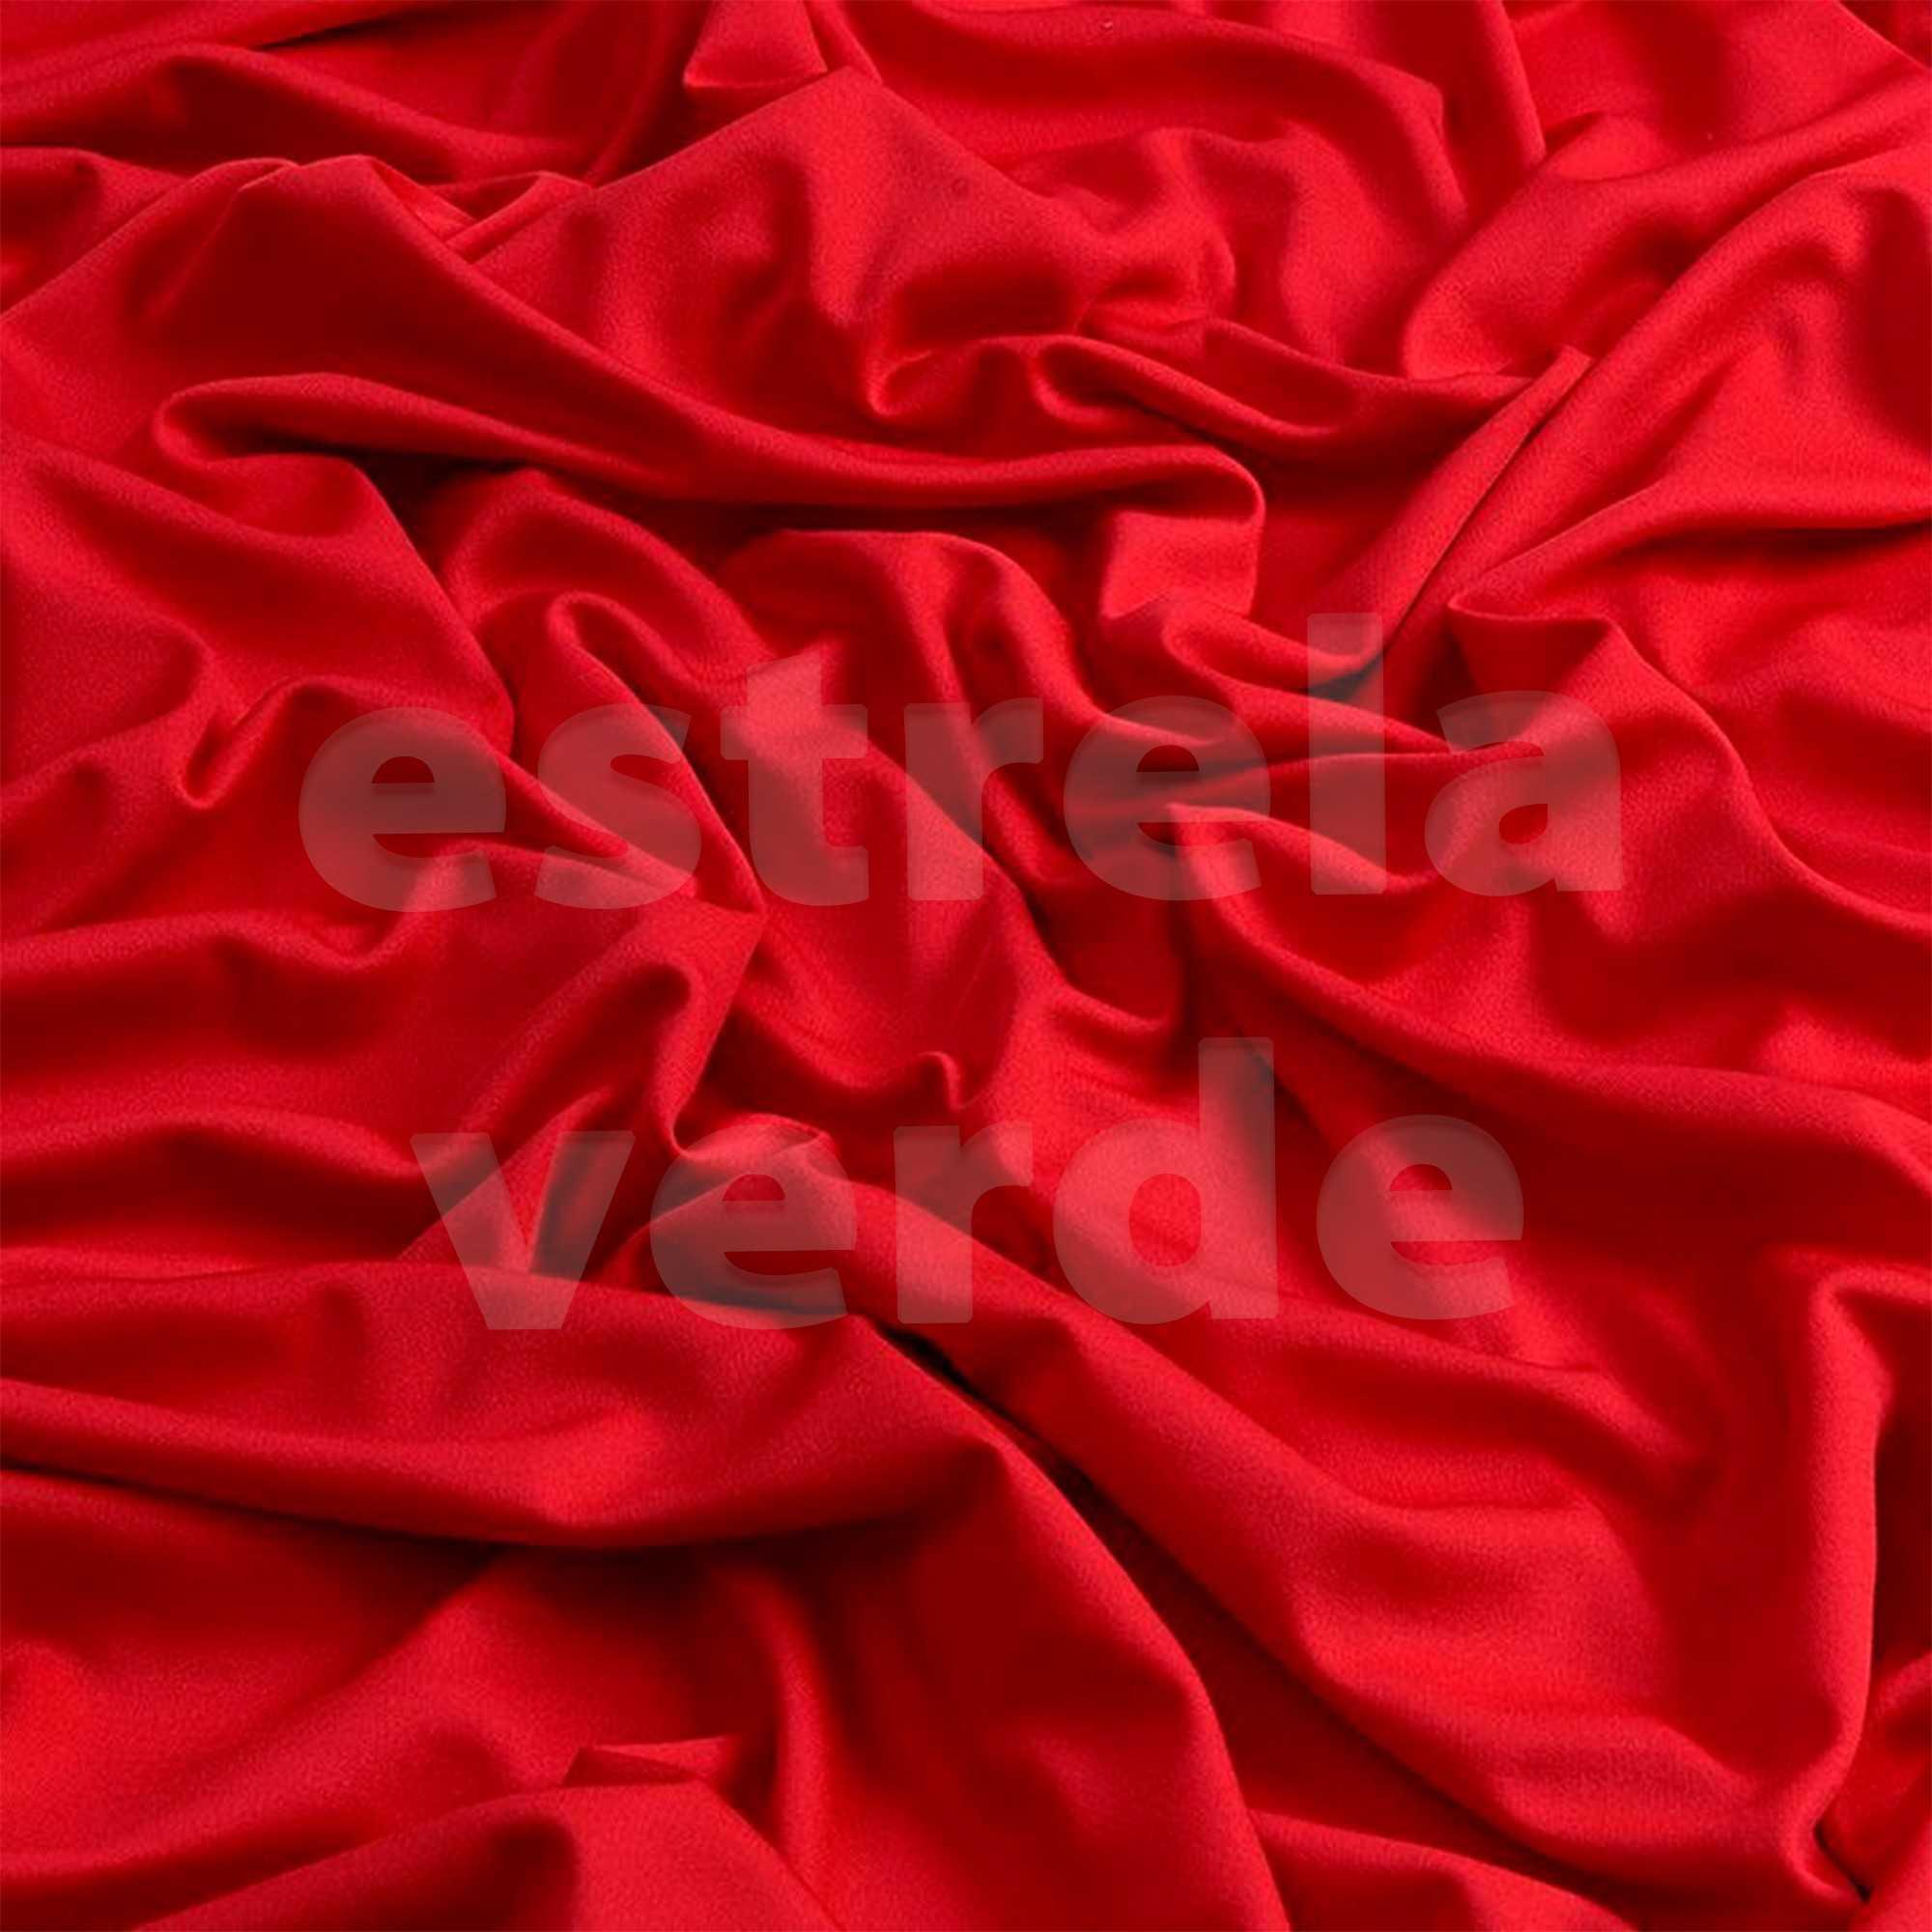 HELANCA LIGHT VERMELHO FERRARI 460 1,80 LARG  - Estrela Verde